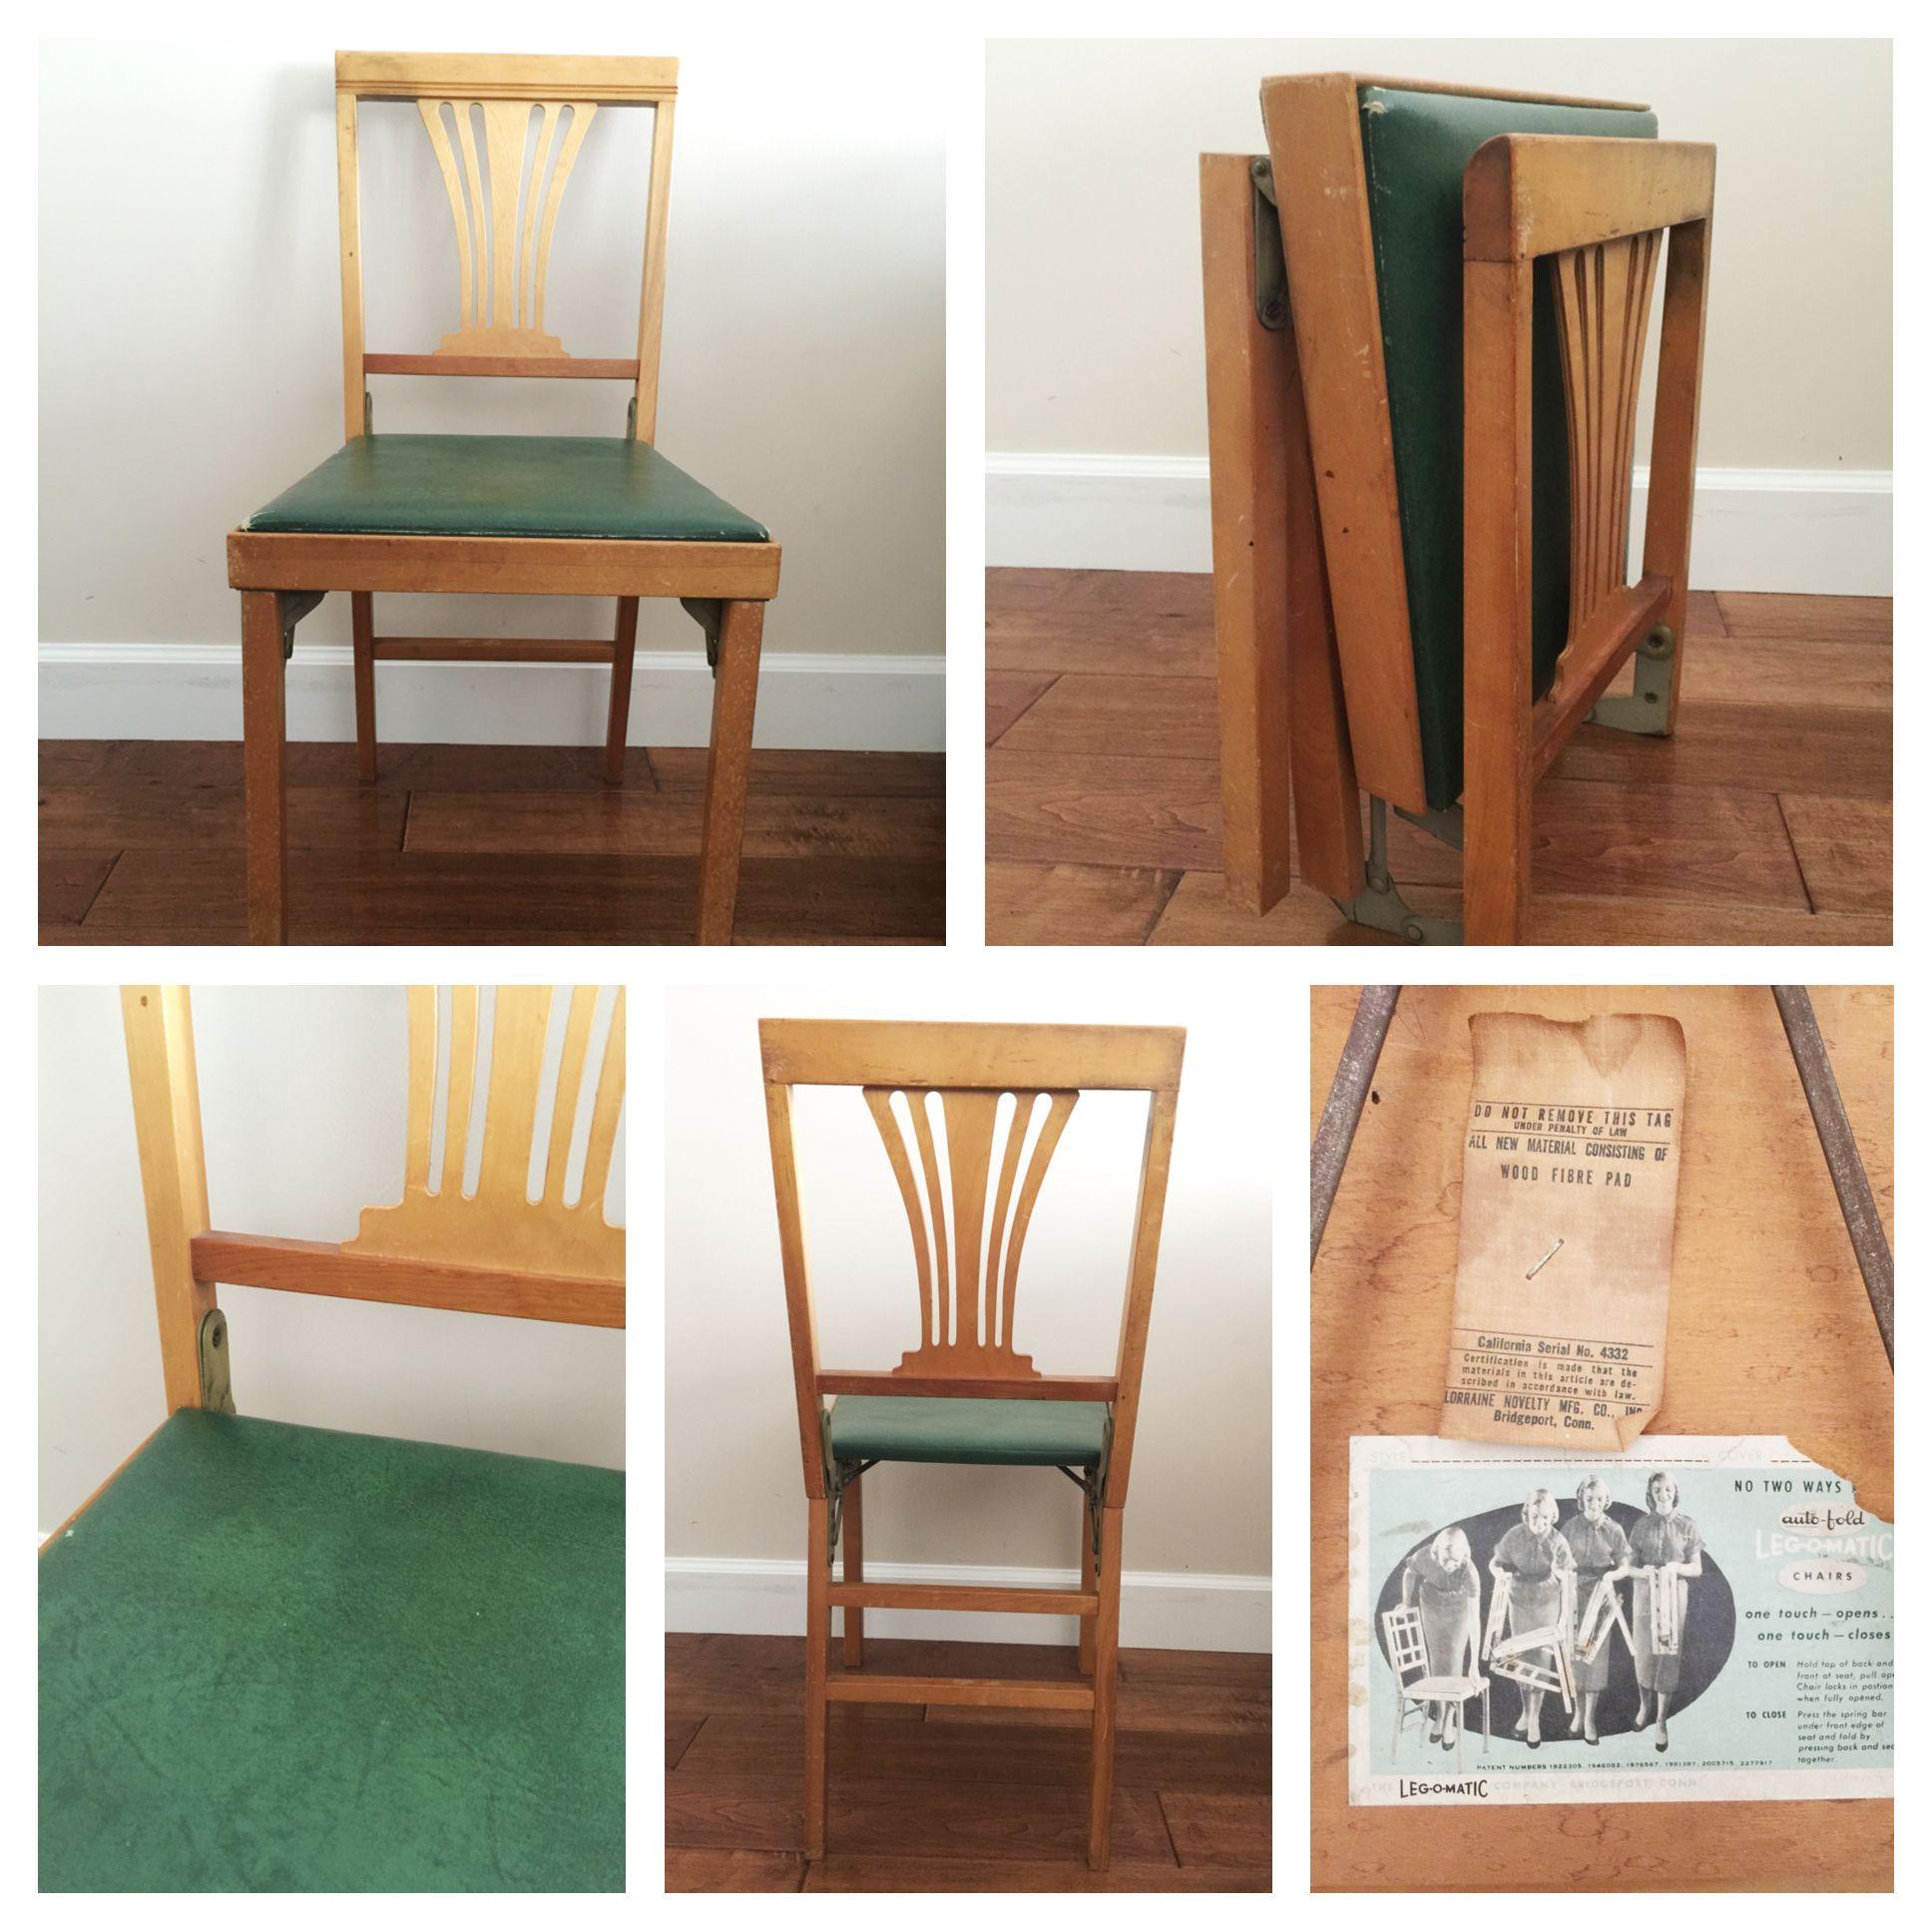 Magnificent Vintage Leg O Matic Solid Wood Travel Chair Authentic Retro Inzonedesignstudio Interior Chair Design Inzonedesignstudiocom